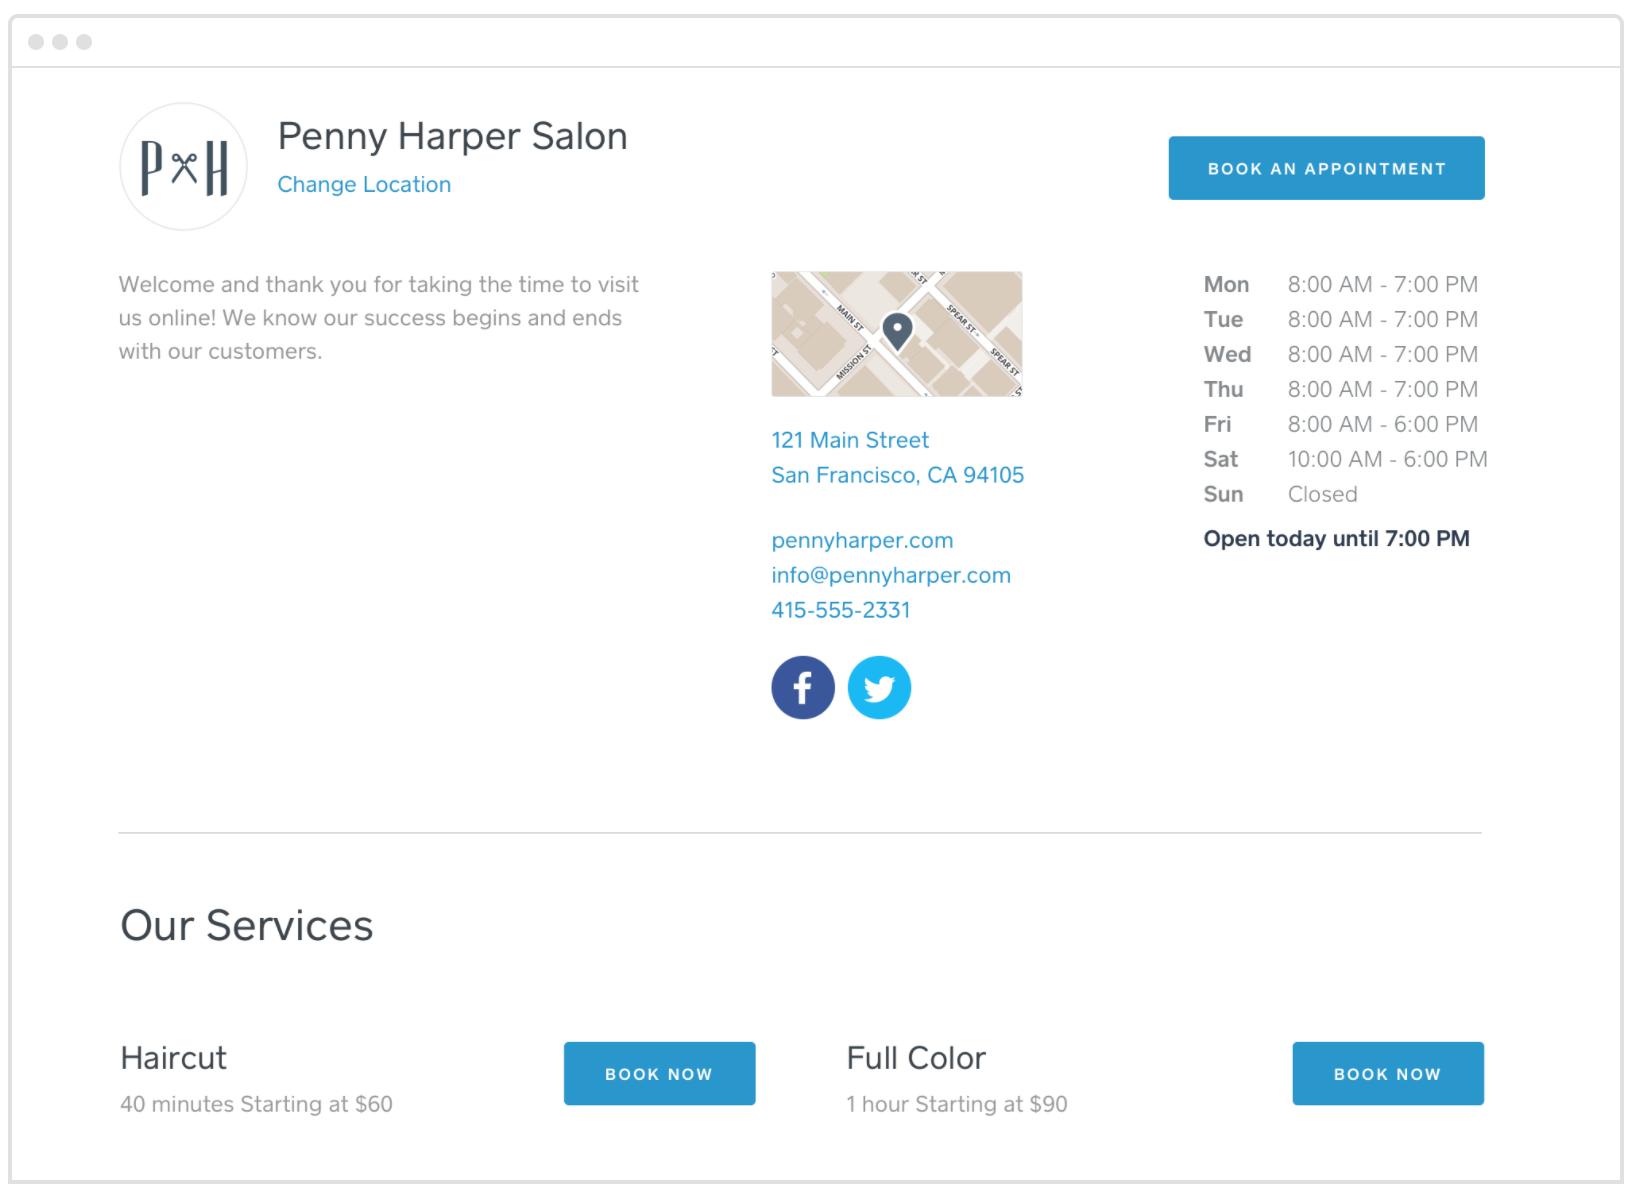 Let clients book appointments online 24/7